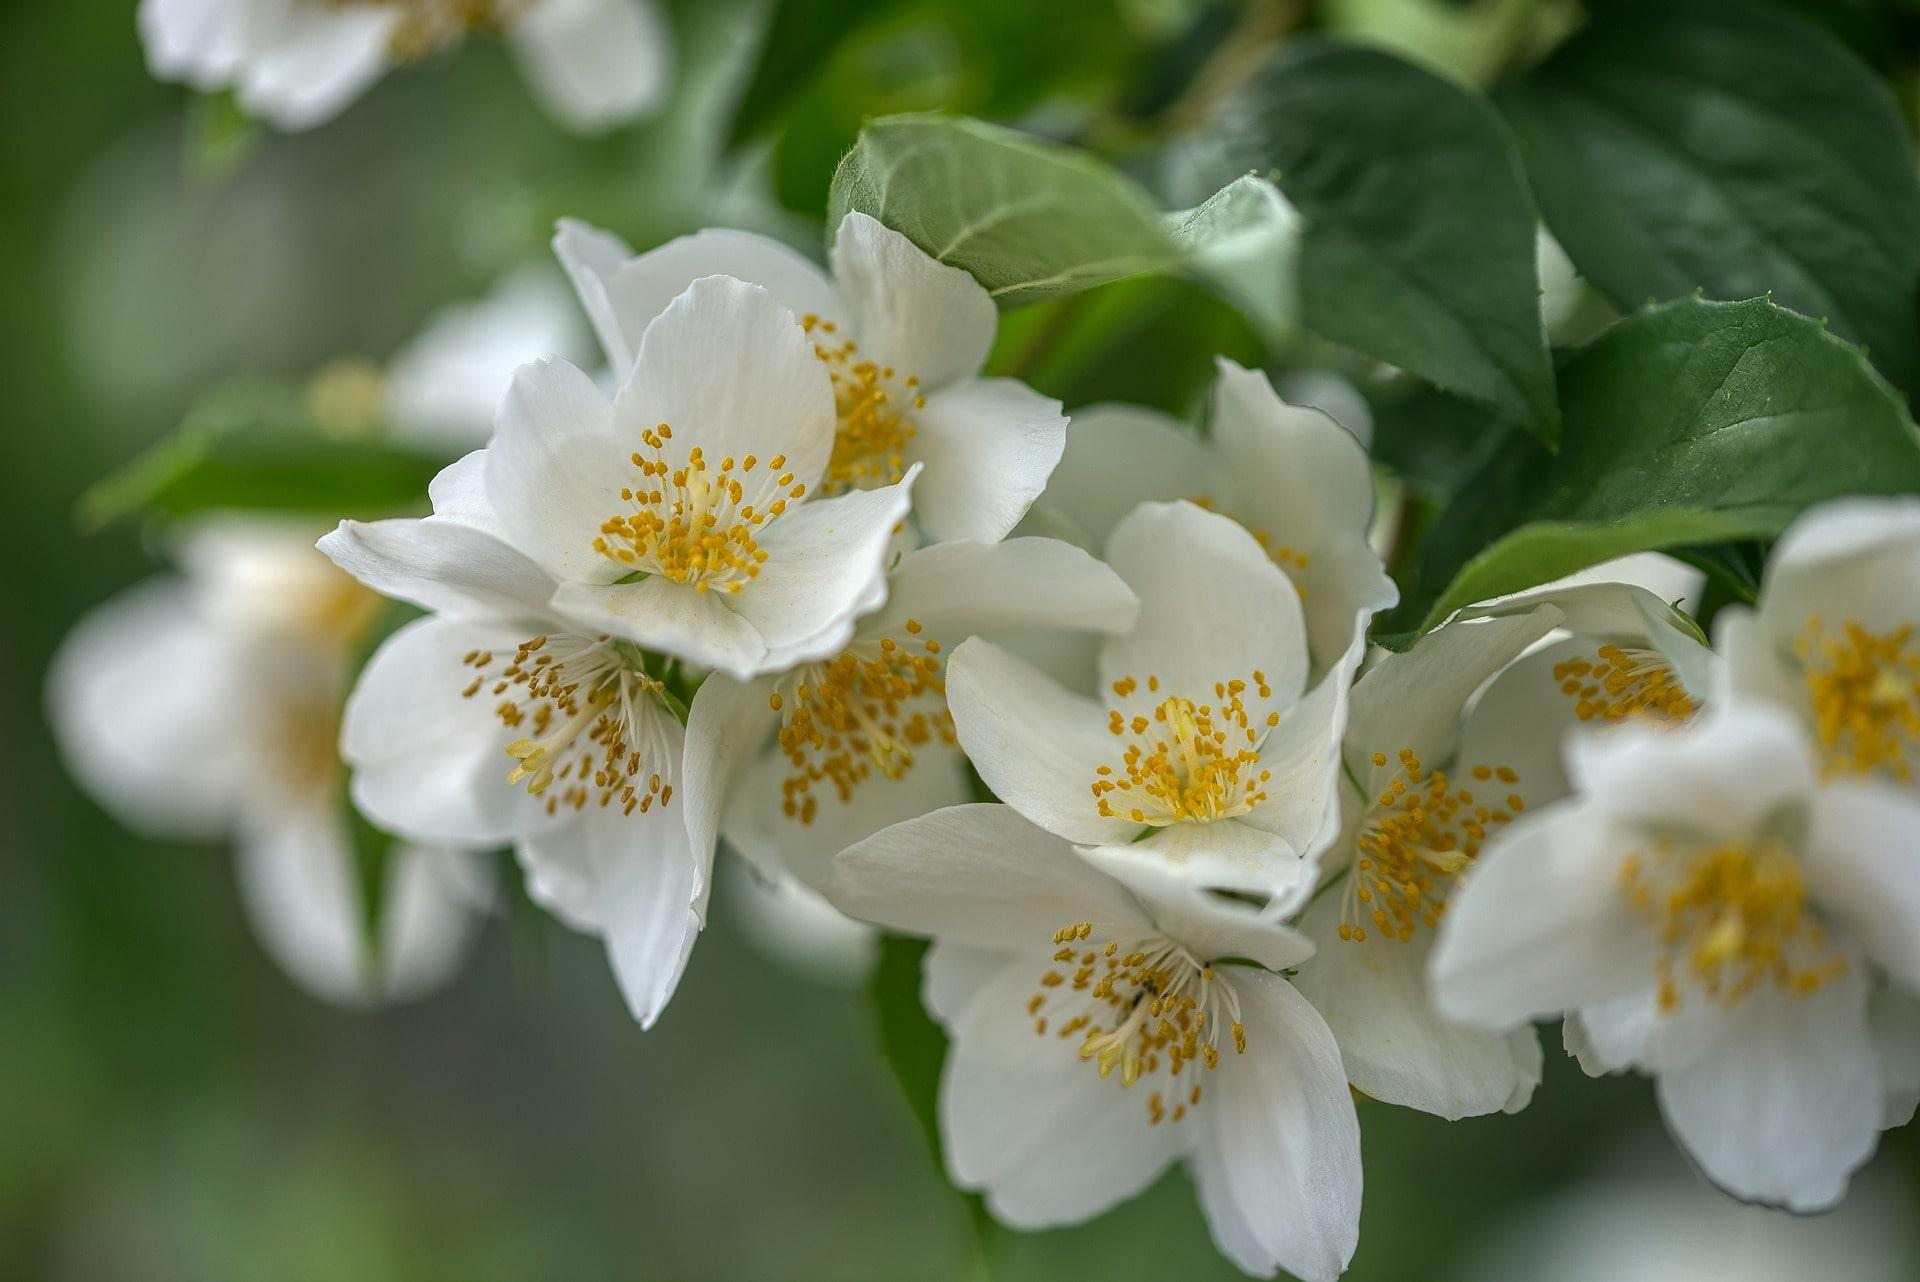 philadelphus jasmin huile essentielle aromatherapie